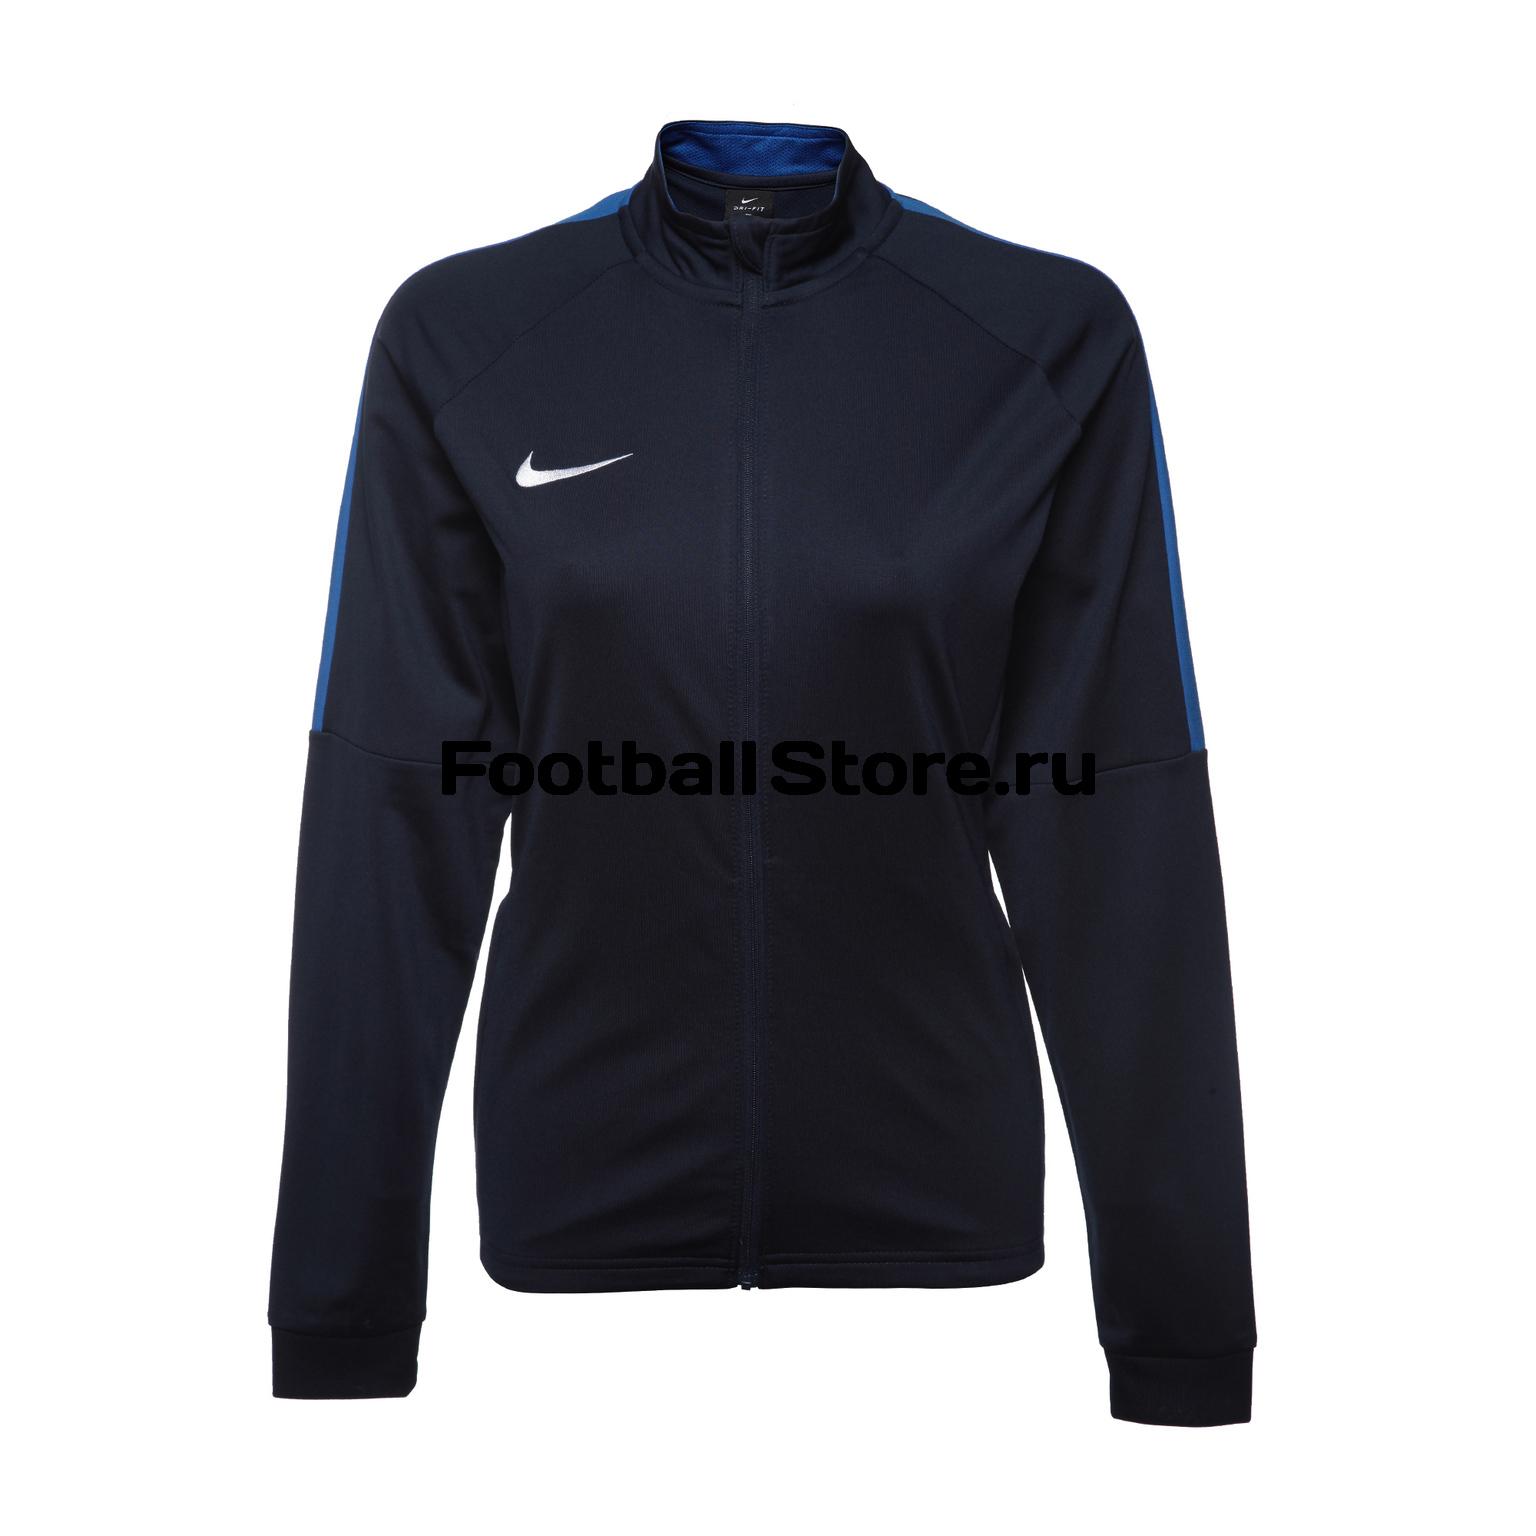 Куртка для костюма женская Nike Dry Academy18 893767-451